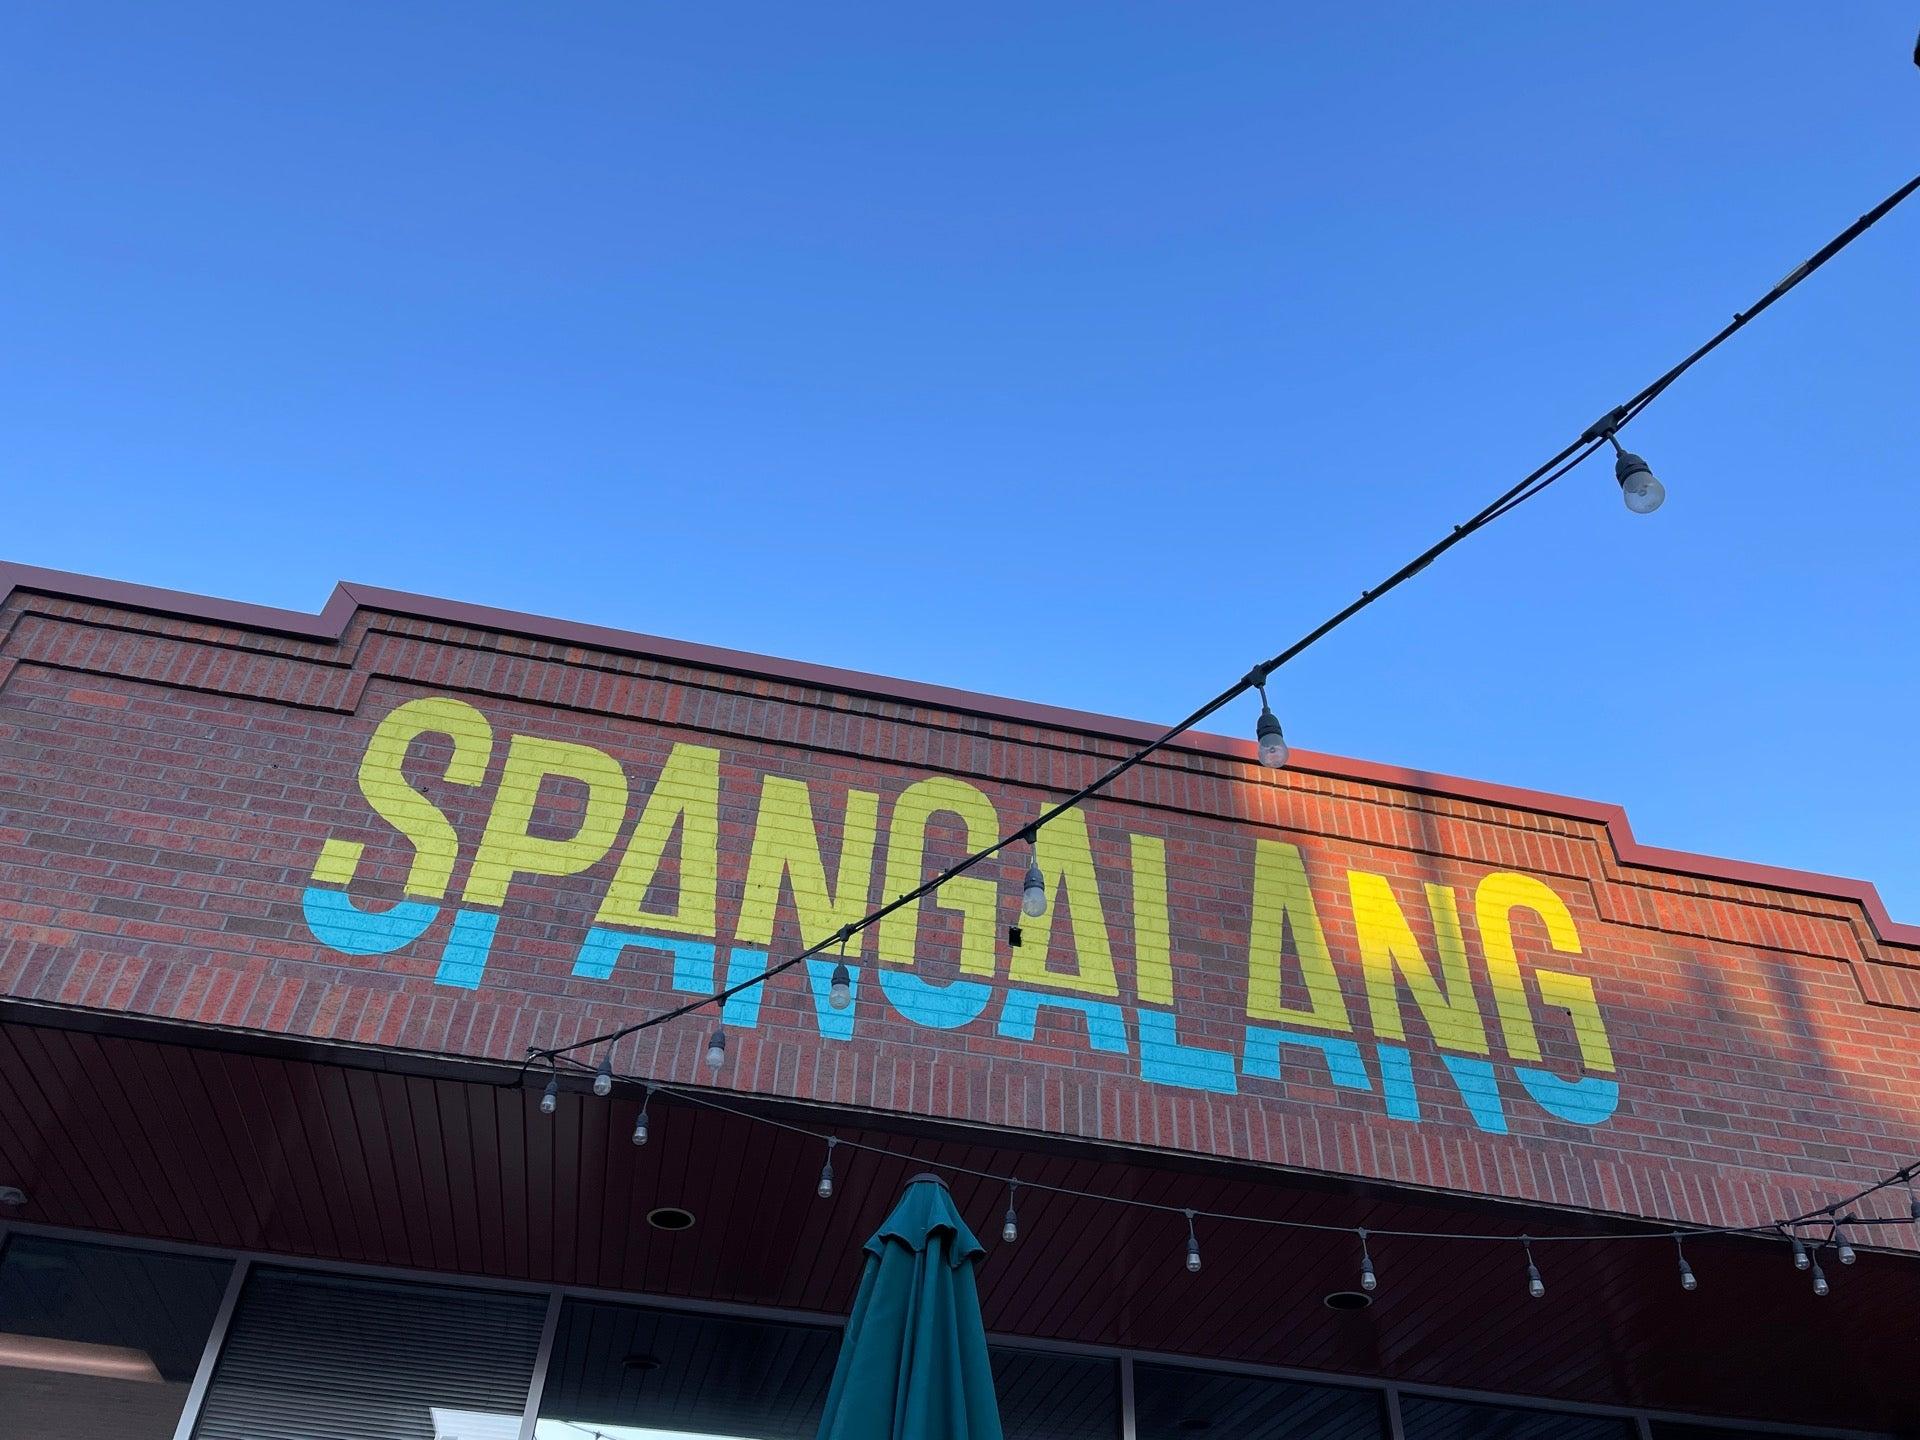 Checked in at Spangalang Brewery